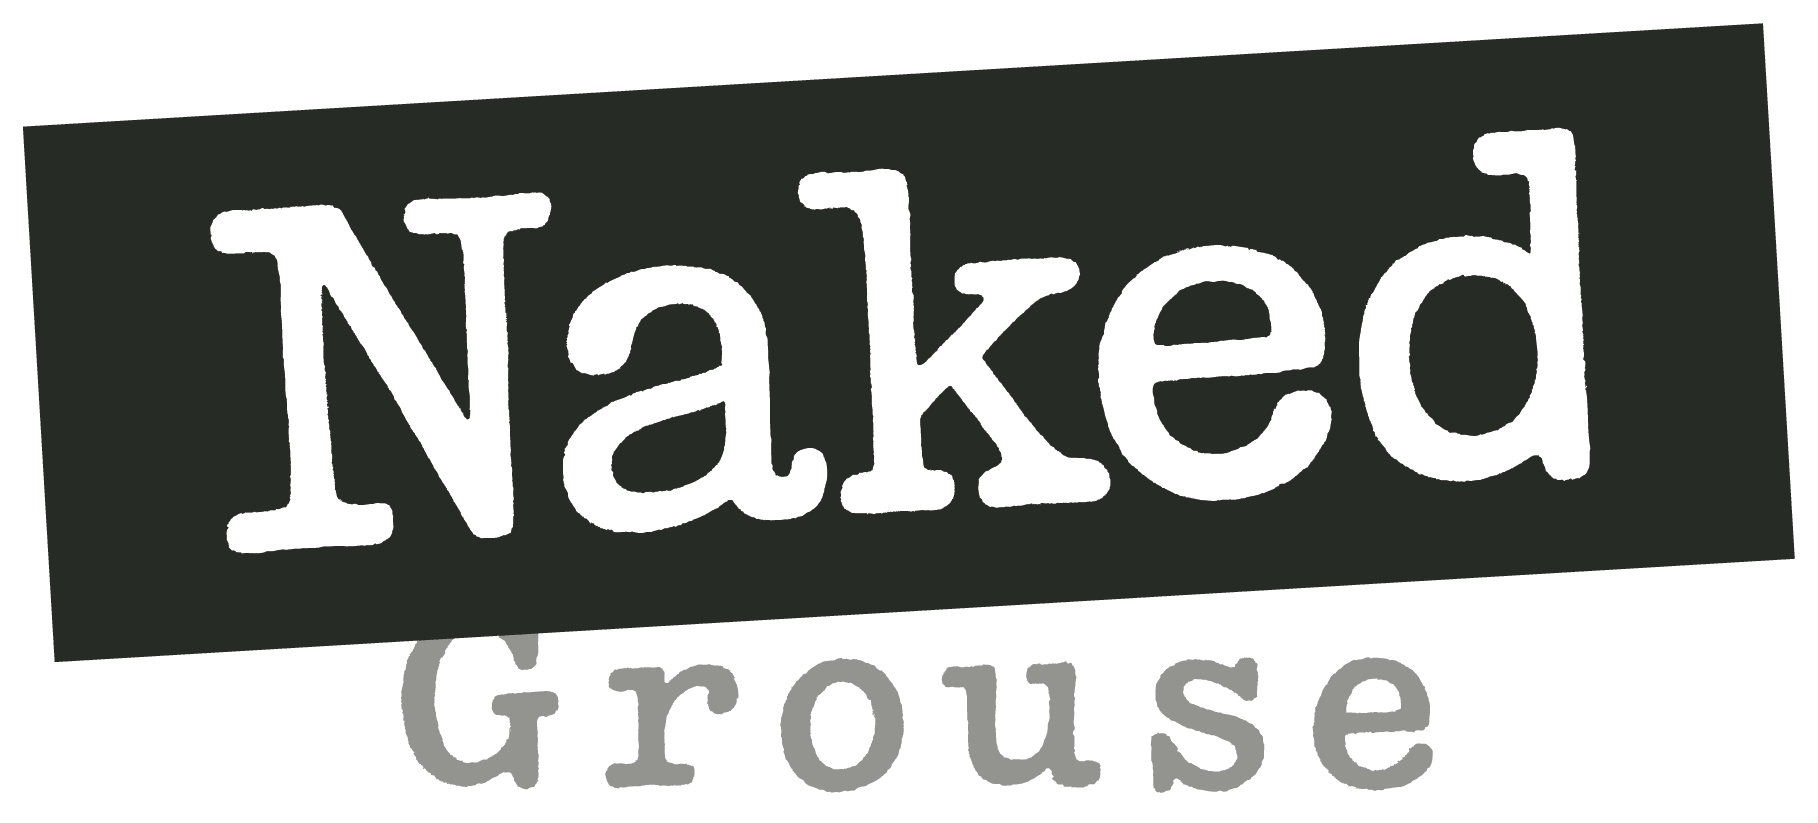 naked grouse logo